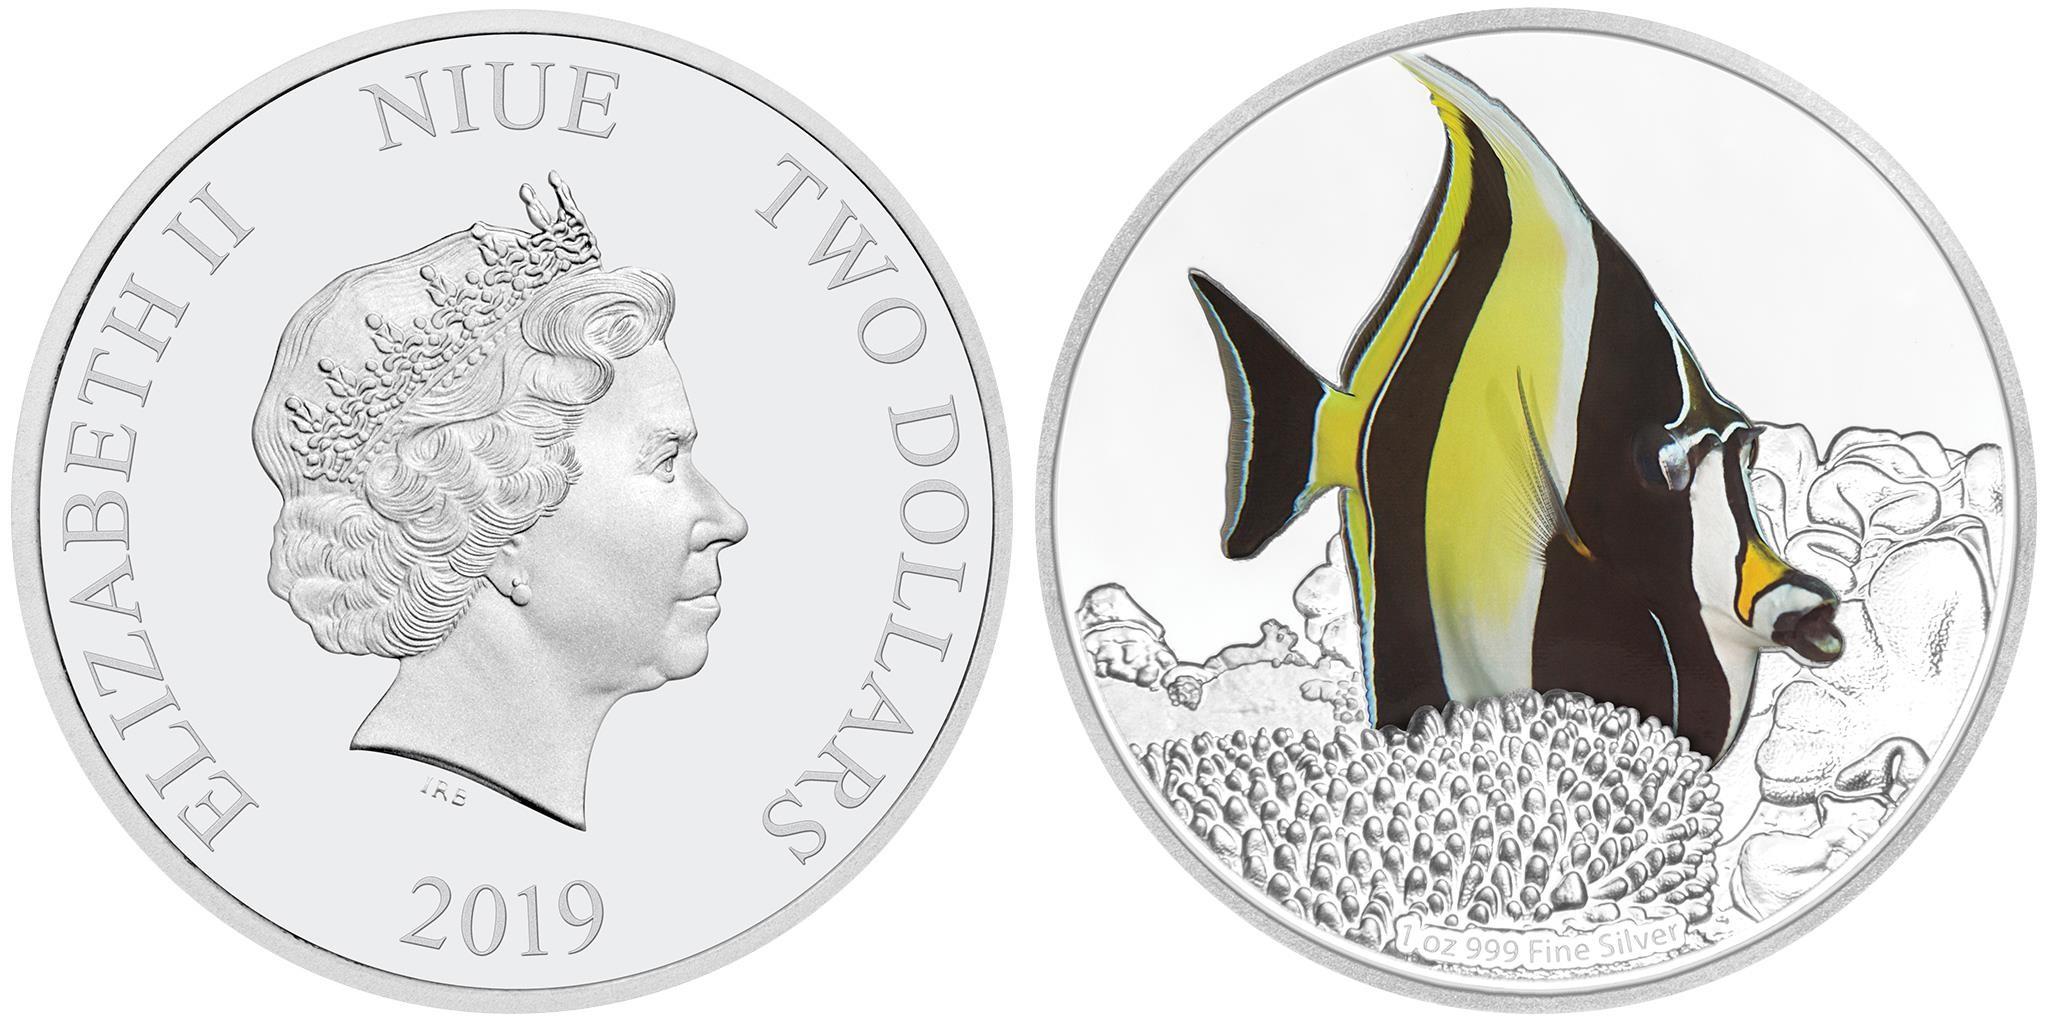 niue 2019 poisson de corail zancle cornu